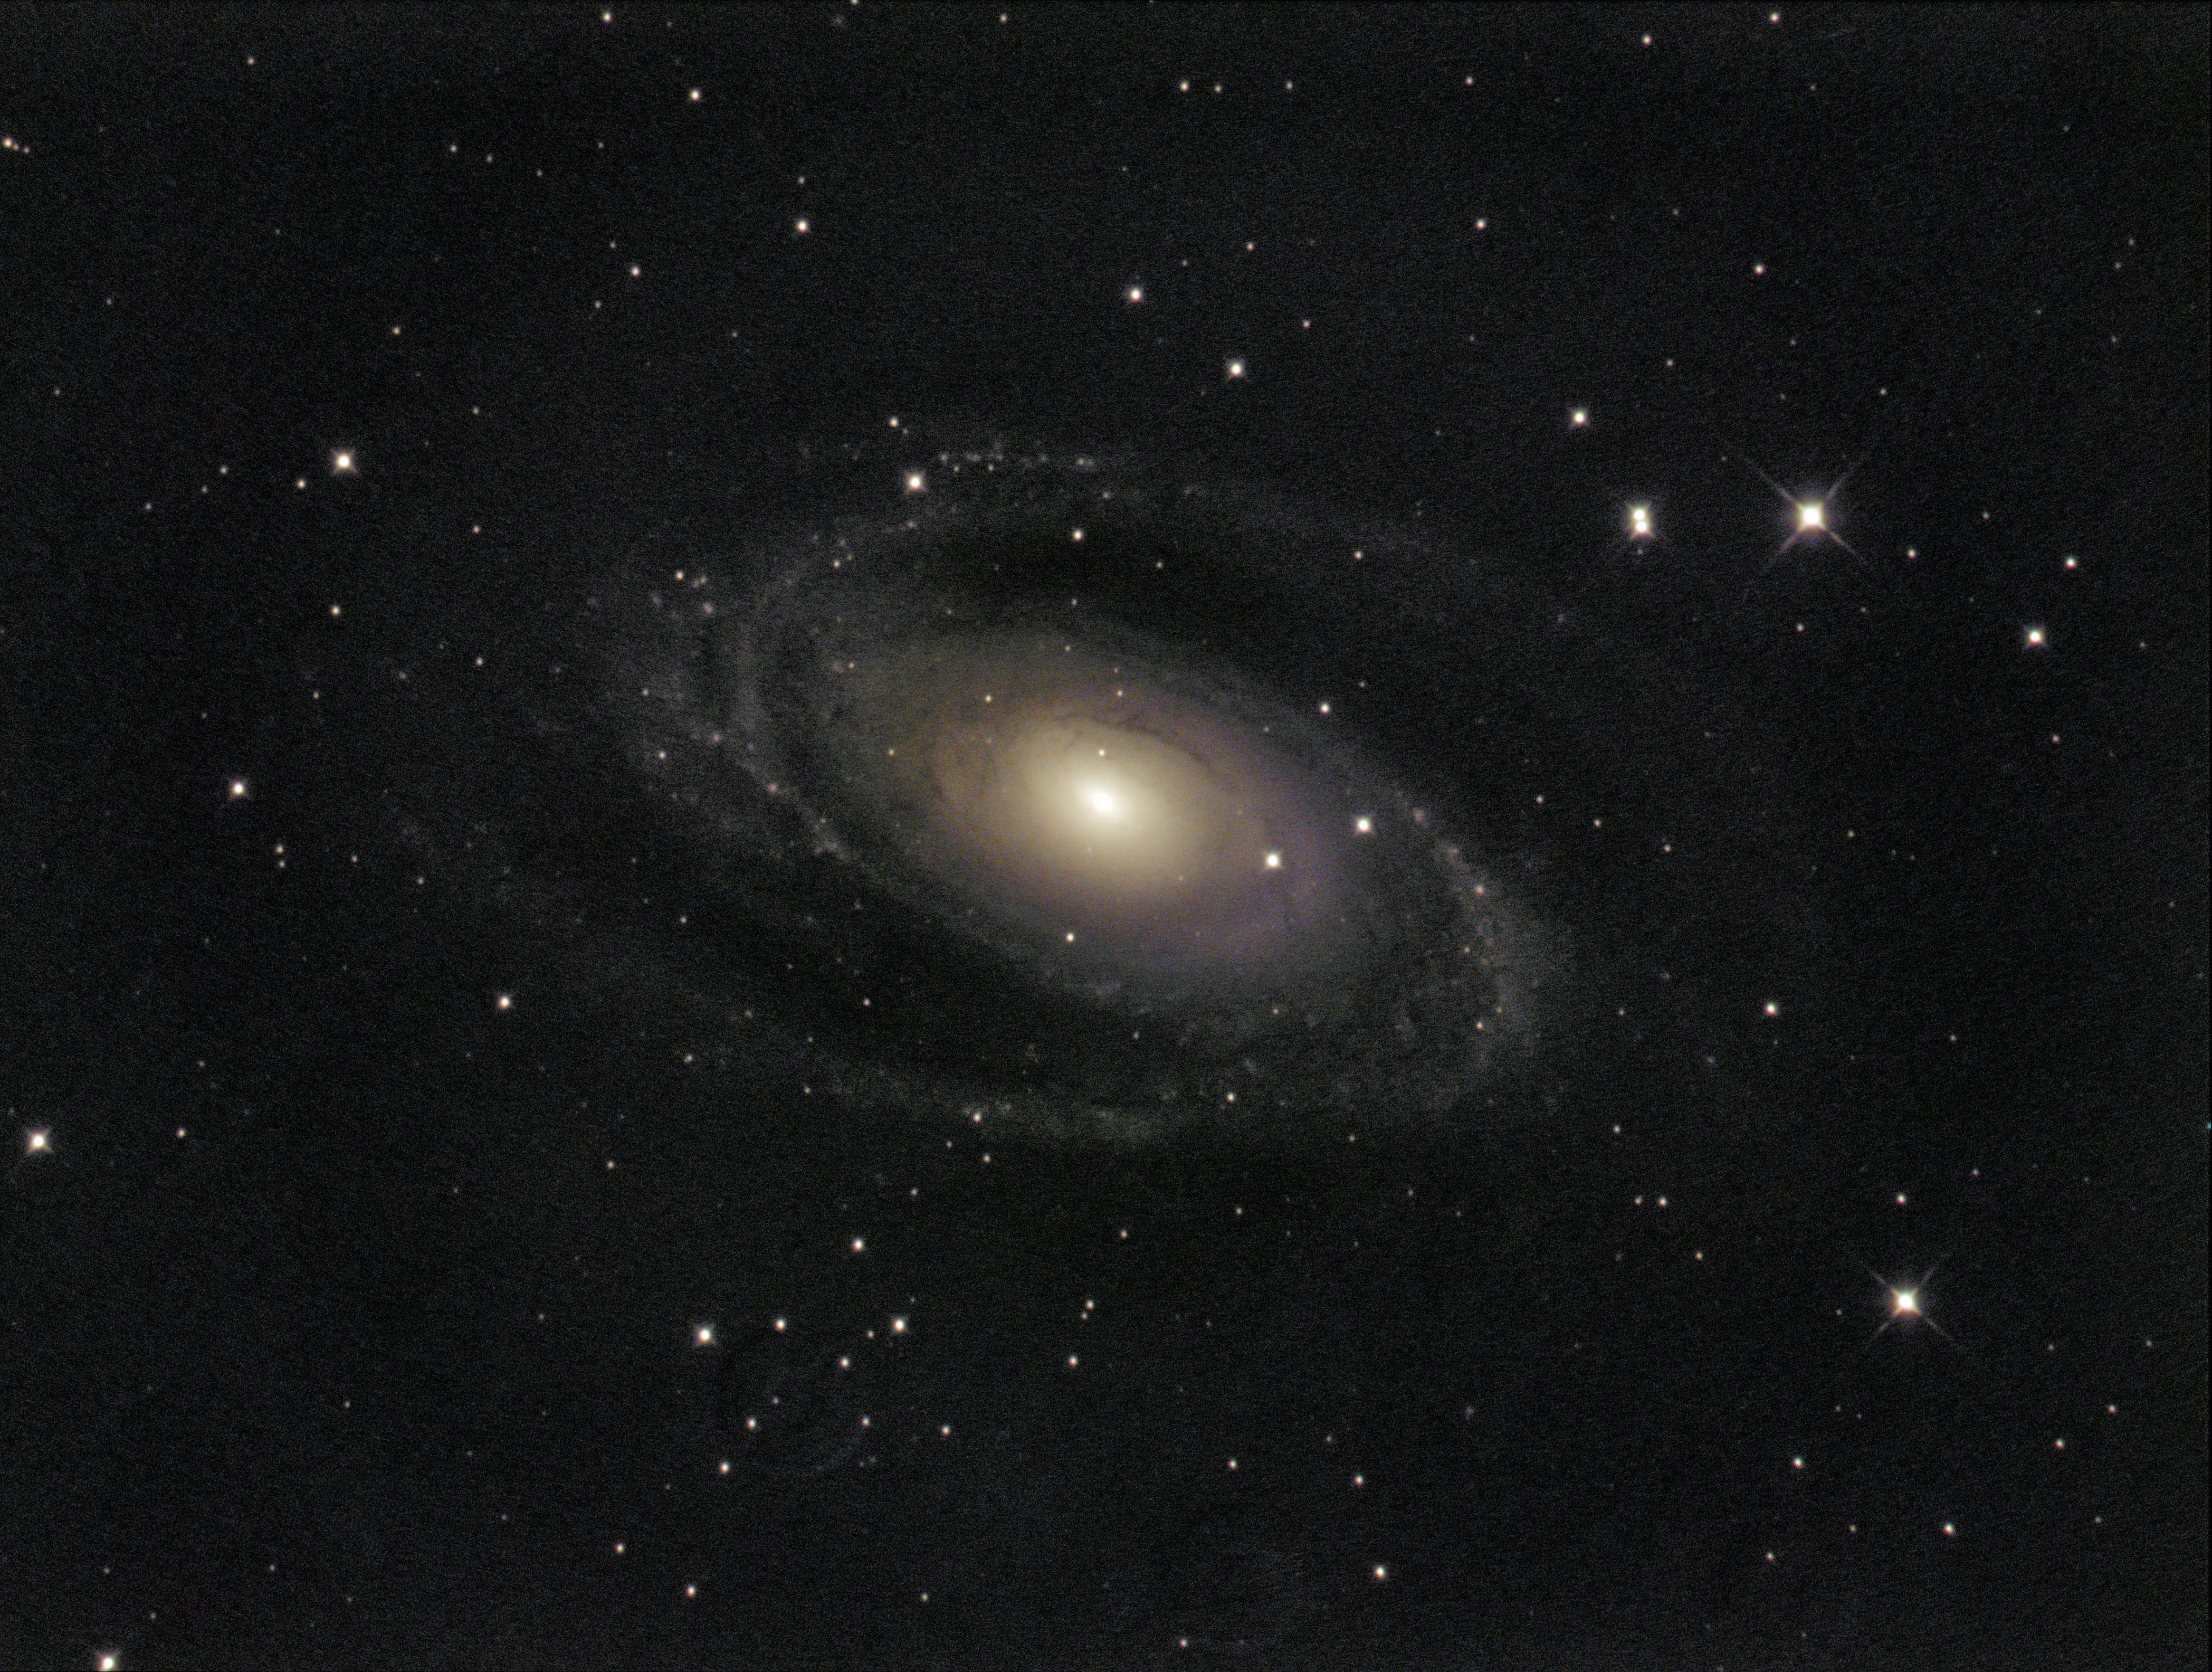 M81 C11 1600MM1 gain139 120s LRGB